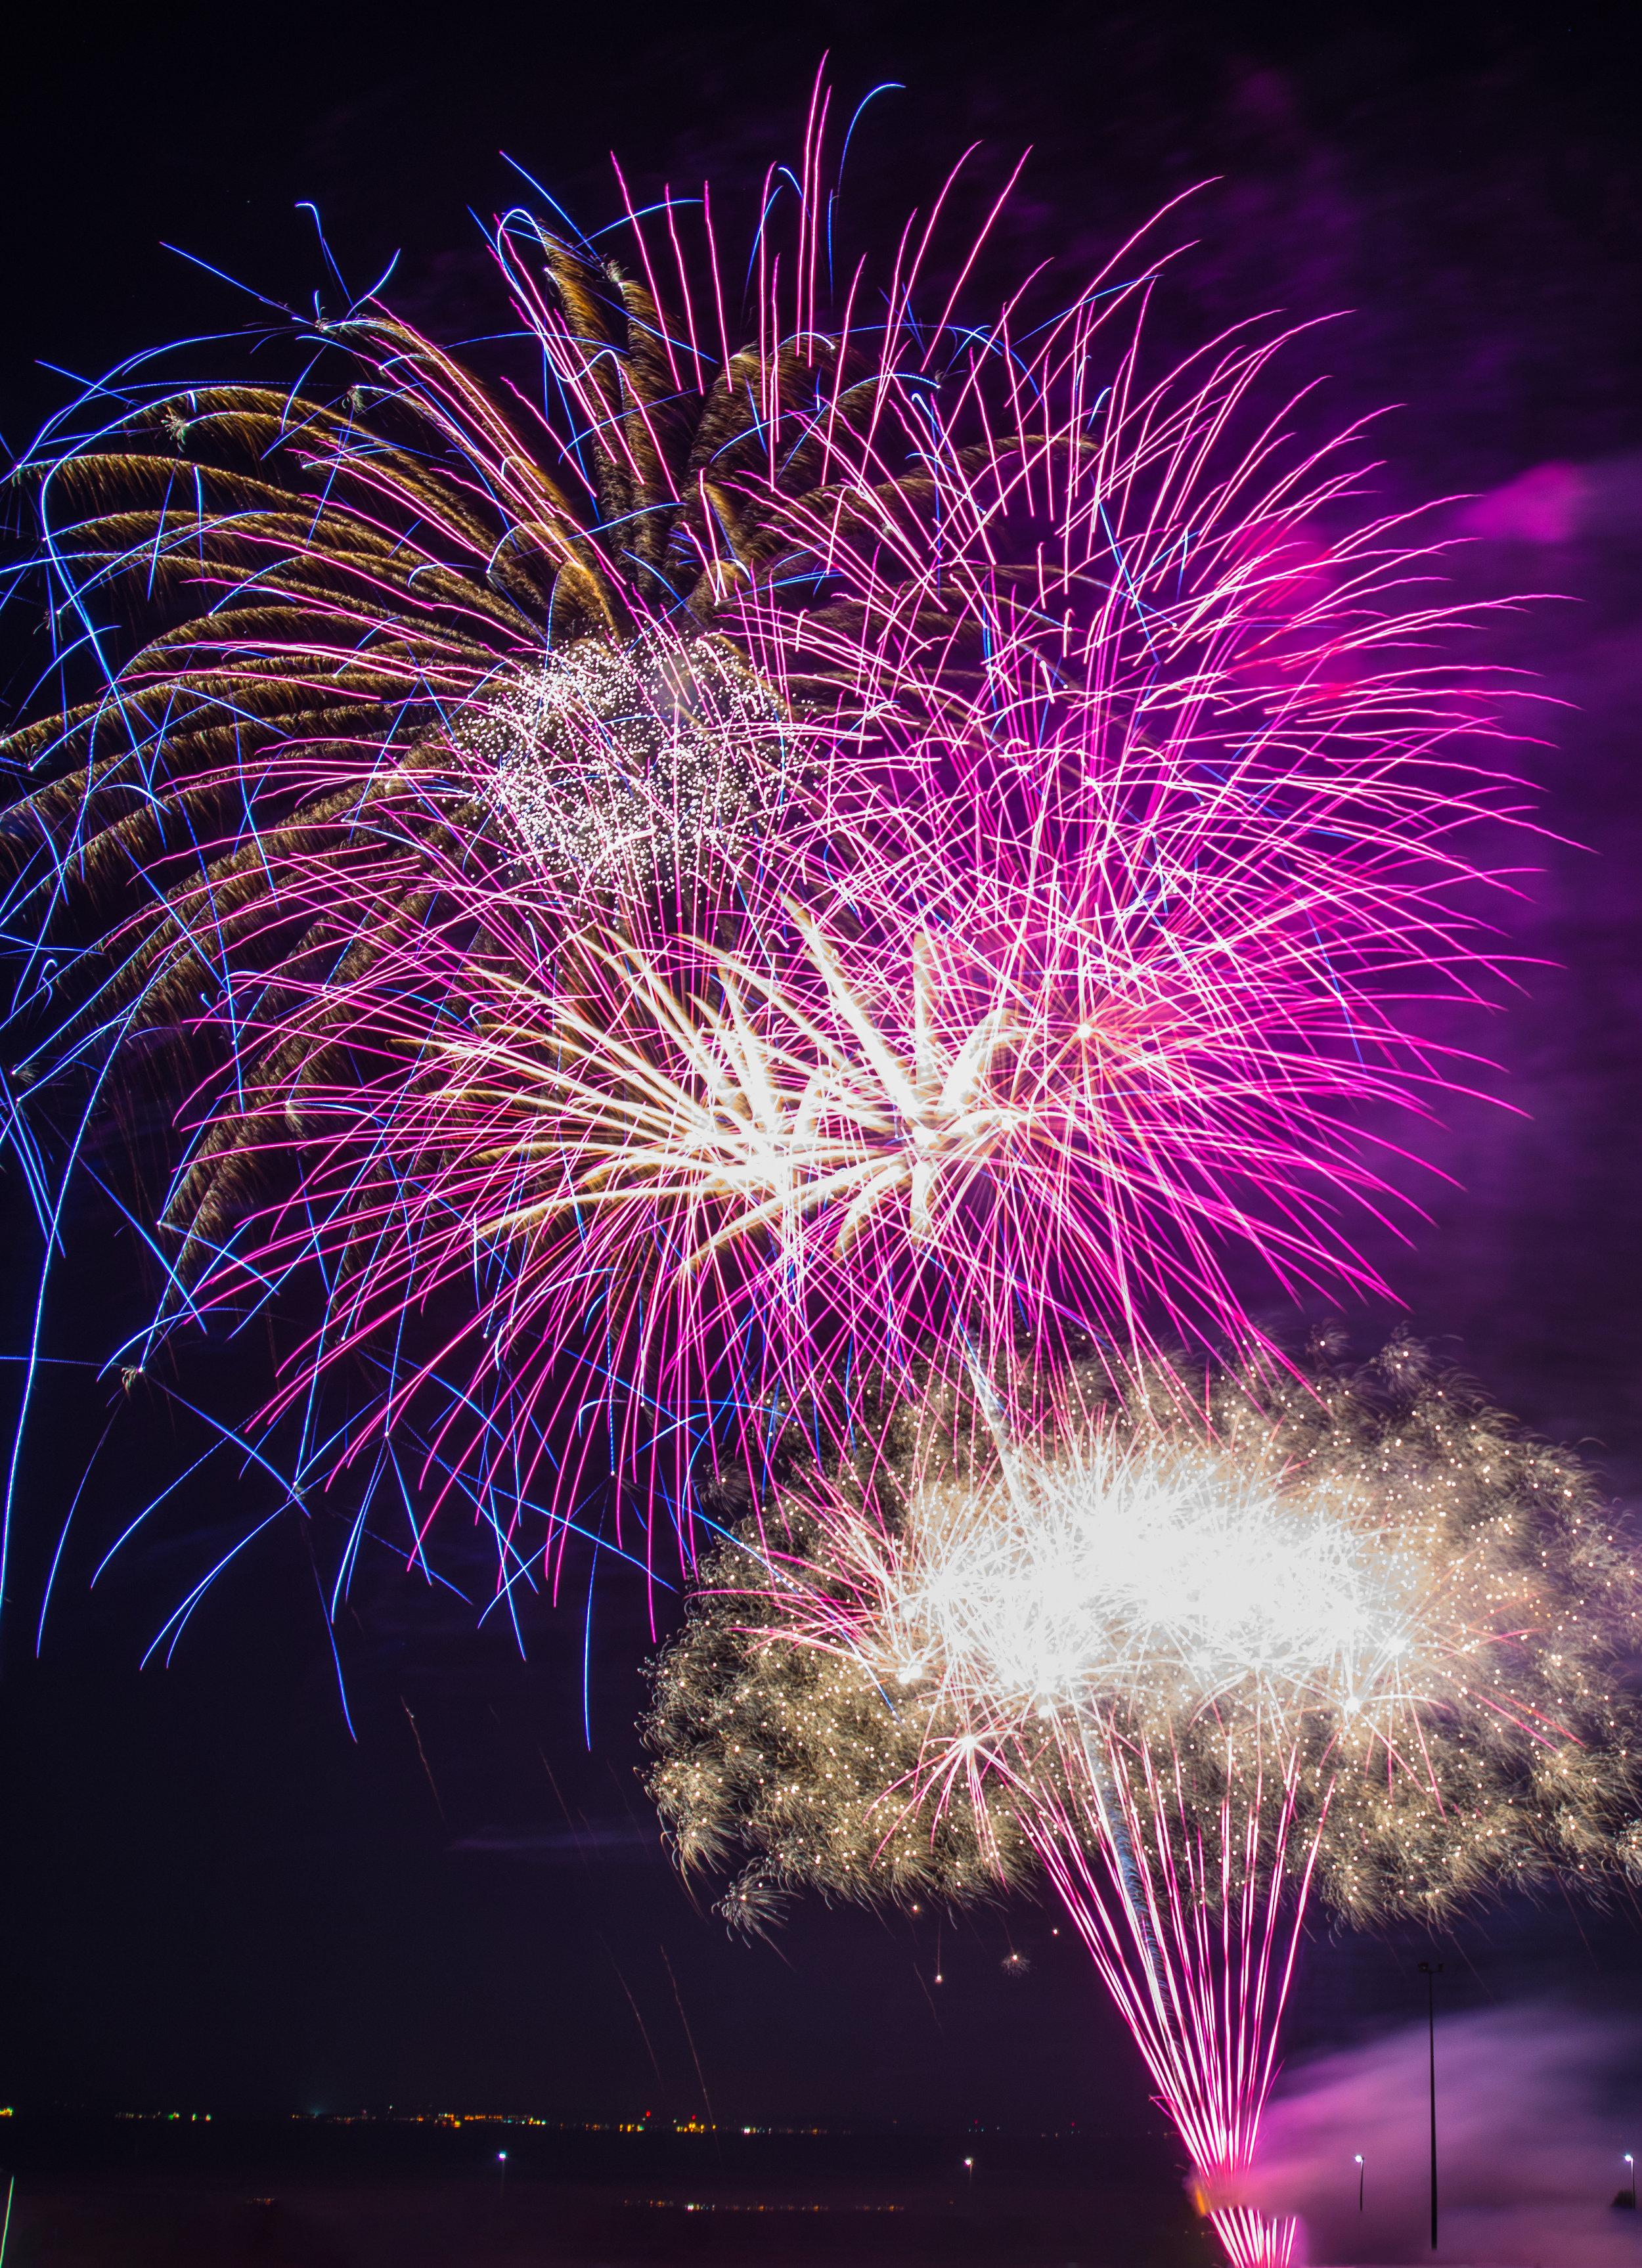 Fireworks 82 edited.jpg